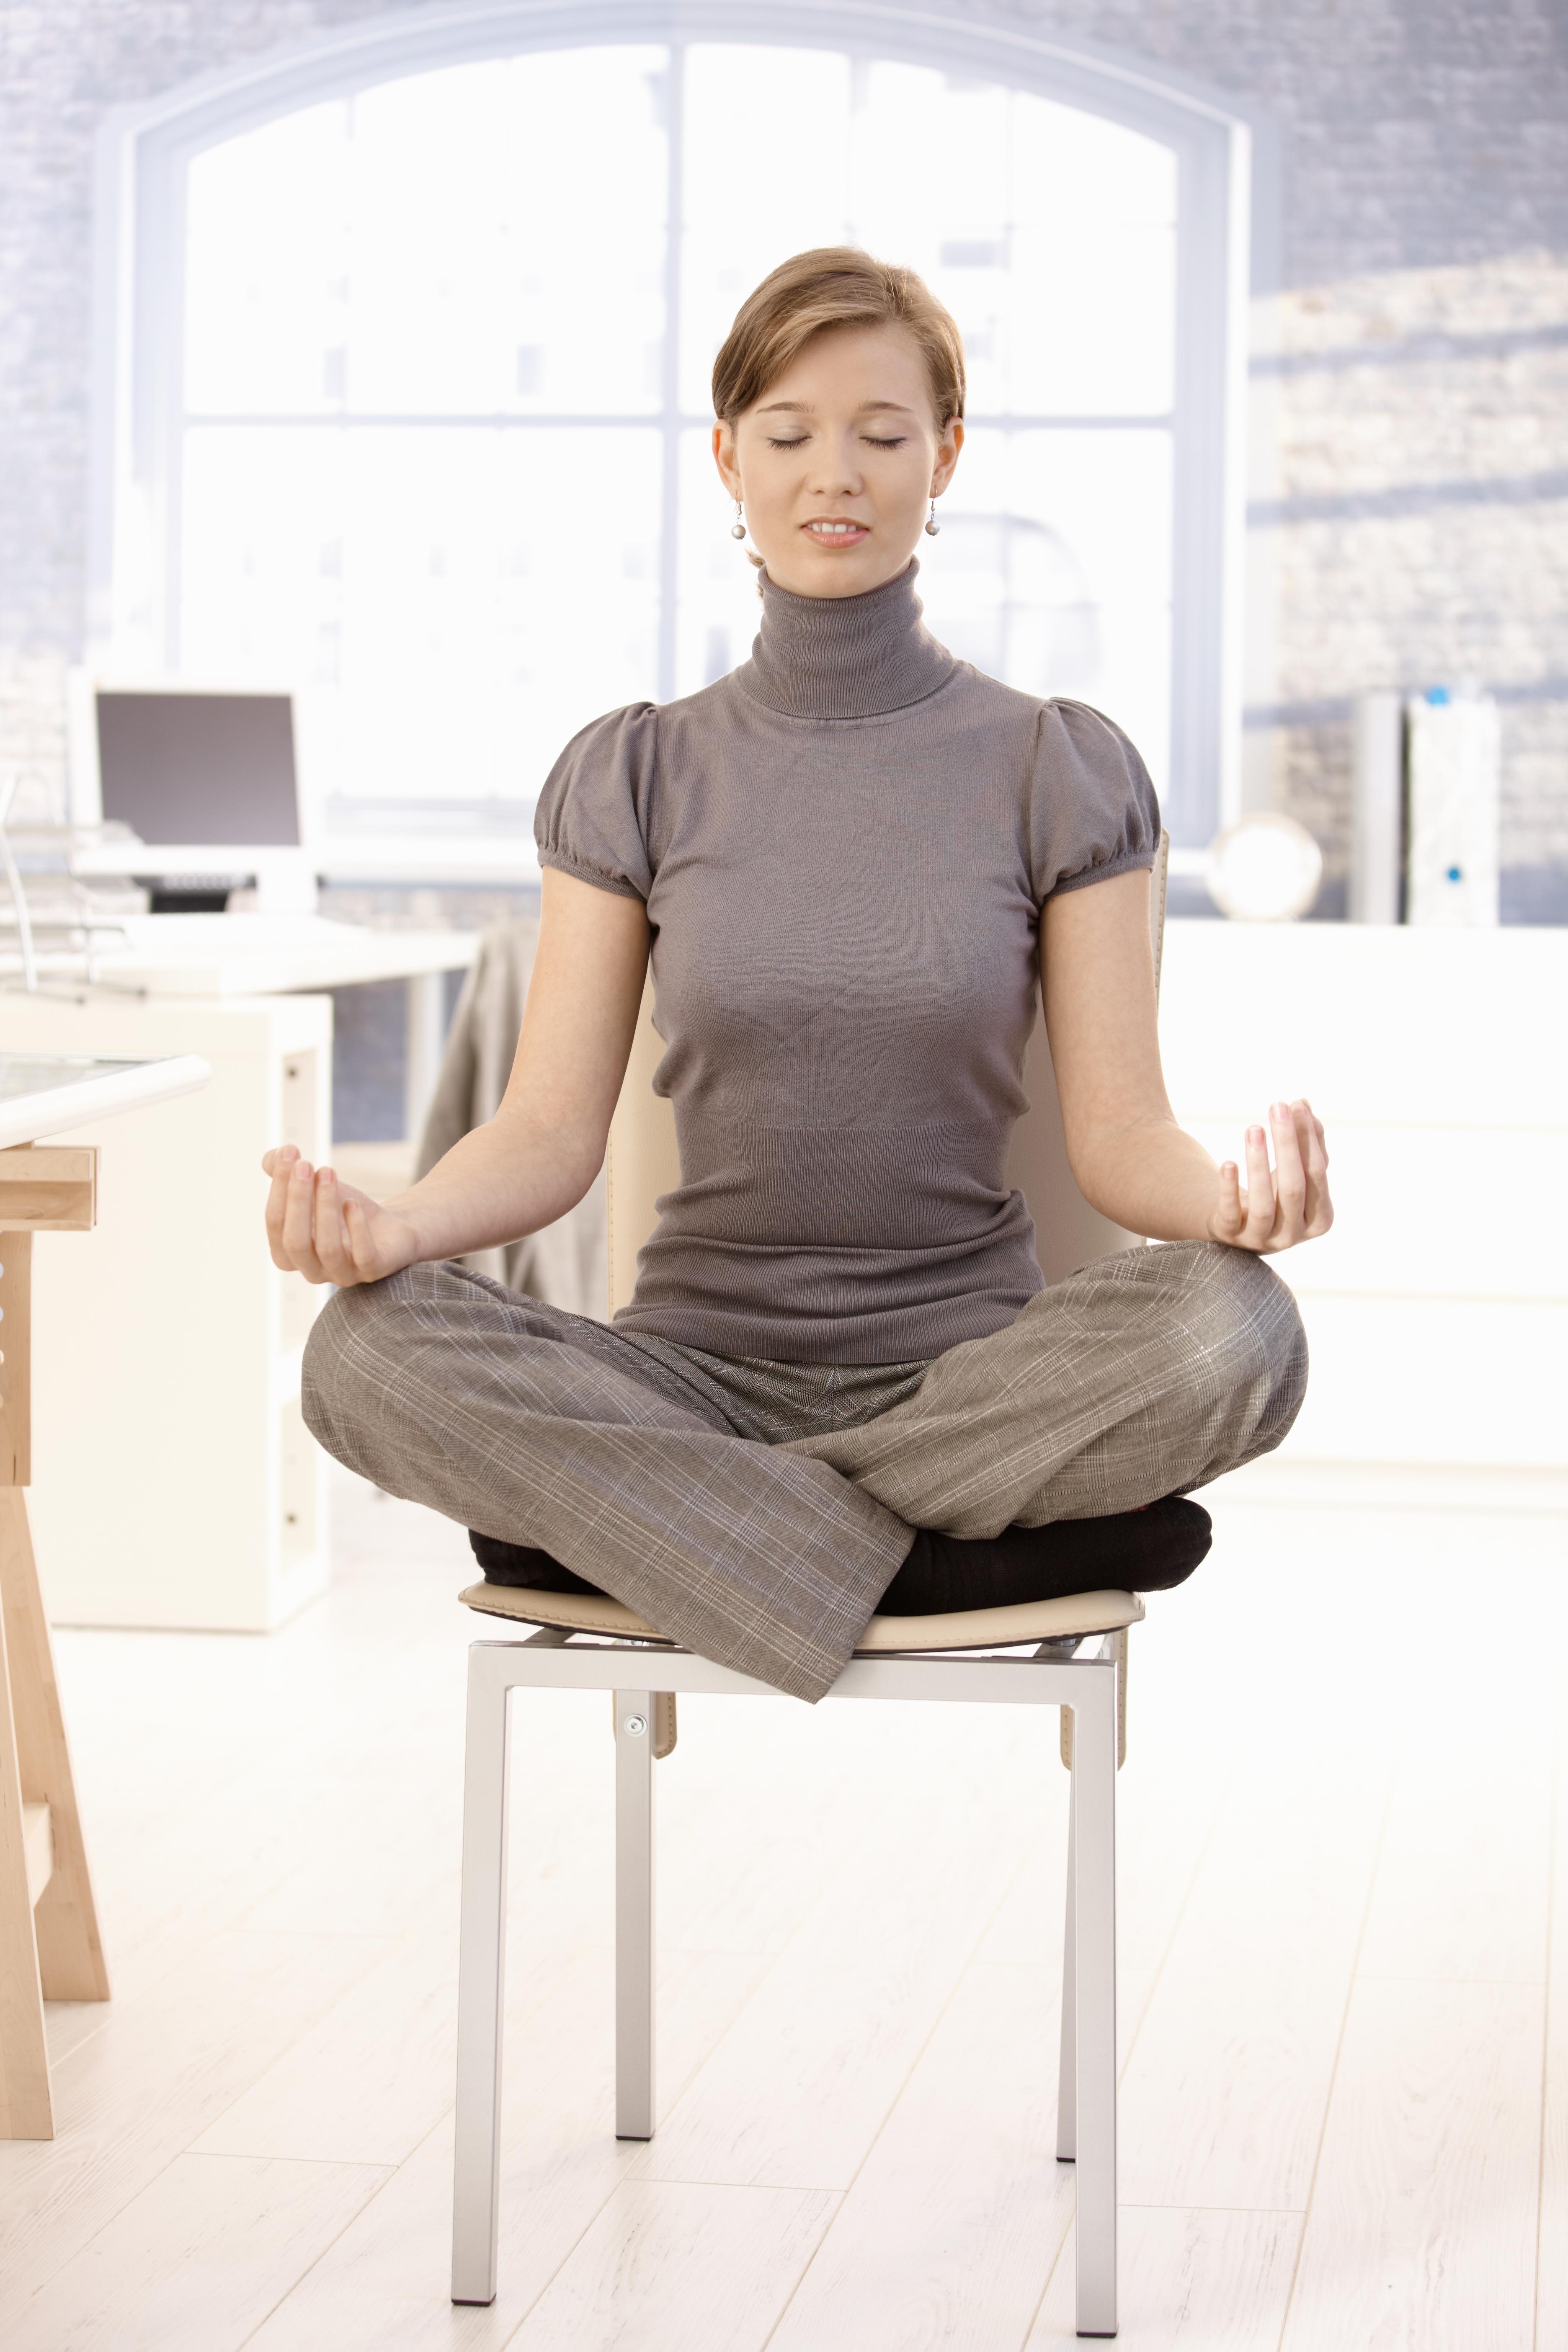 meditation office. How To Meditate In Office. Women Meditates On Coffee Break Office Meditation